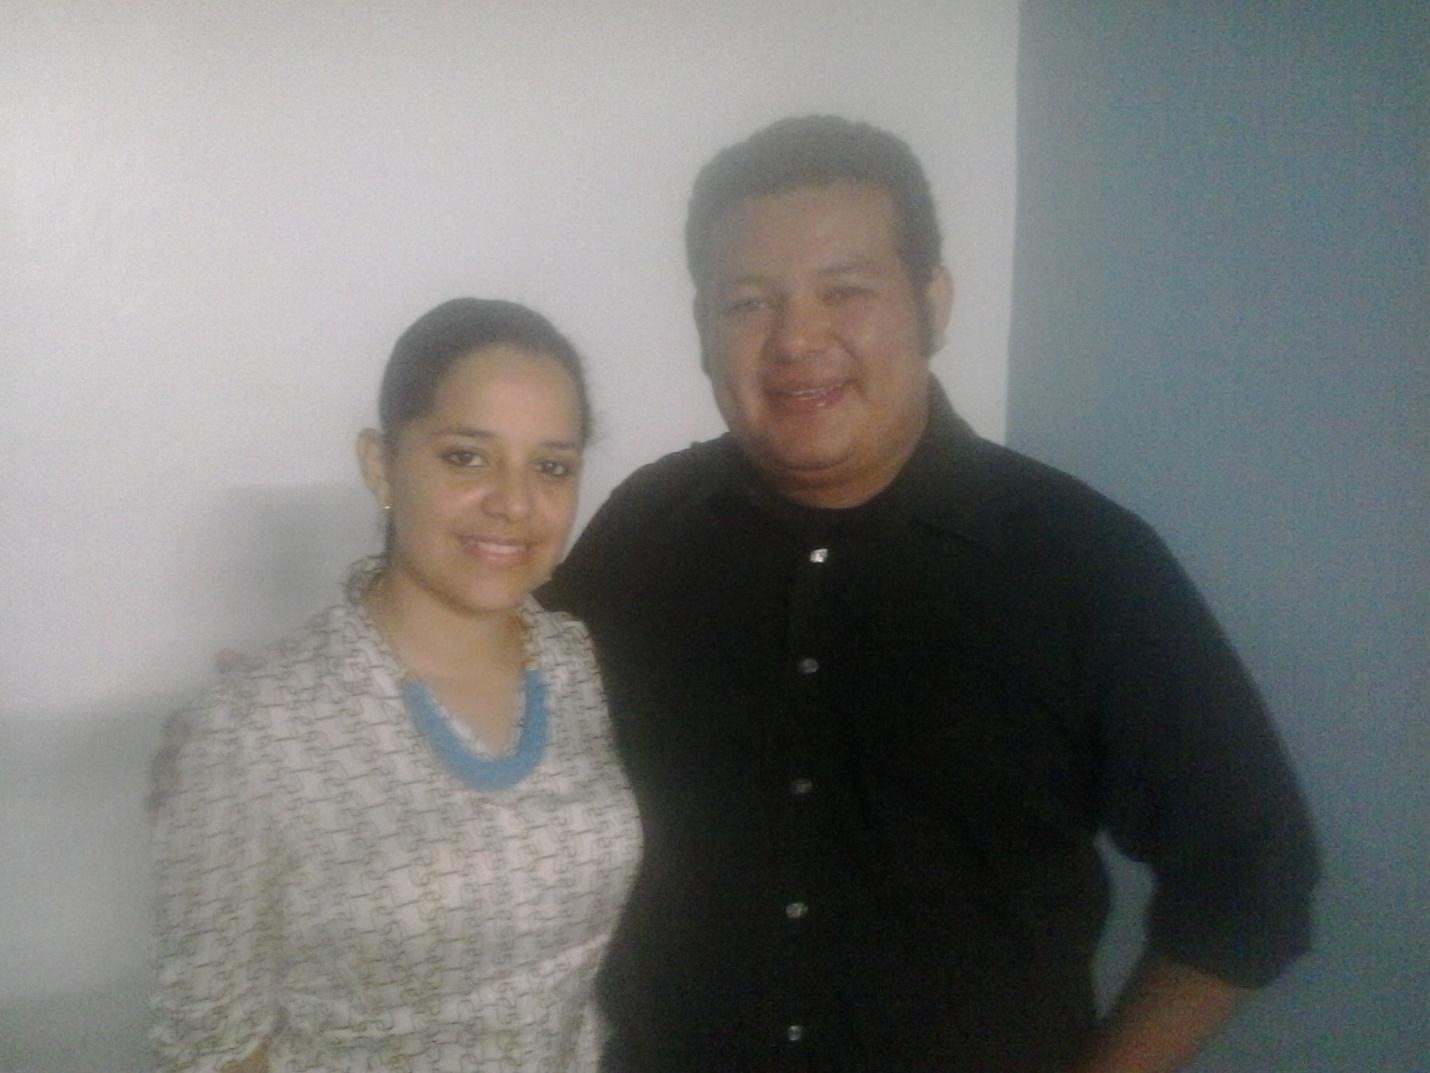 C:\Users\Bayron\Documents\SIFAT\FOTOS\HONDURAS\JUTIAPA\TALLER 1         NIVEL AVANZADO Febrero 26-27   2016\Dr.Pacheco & Ana.jpg